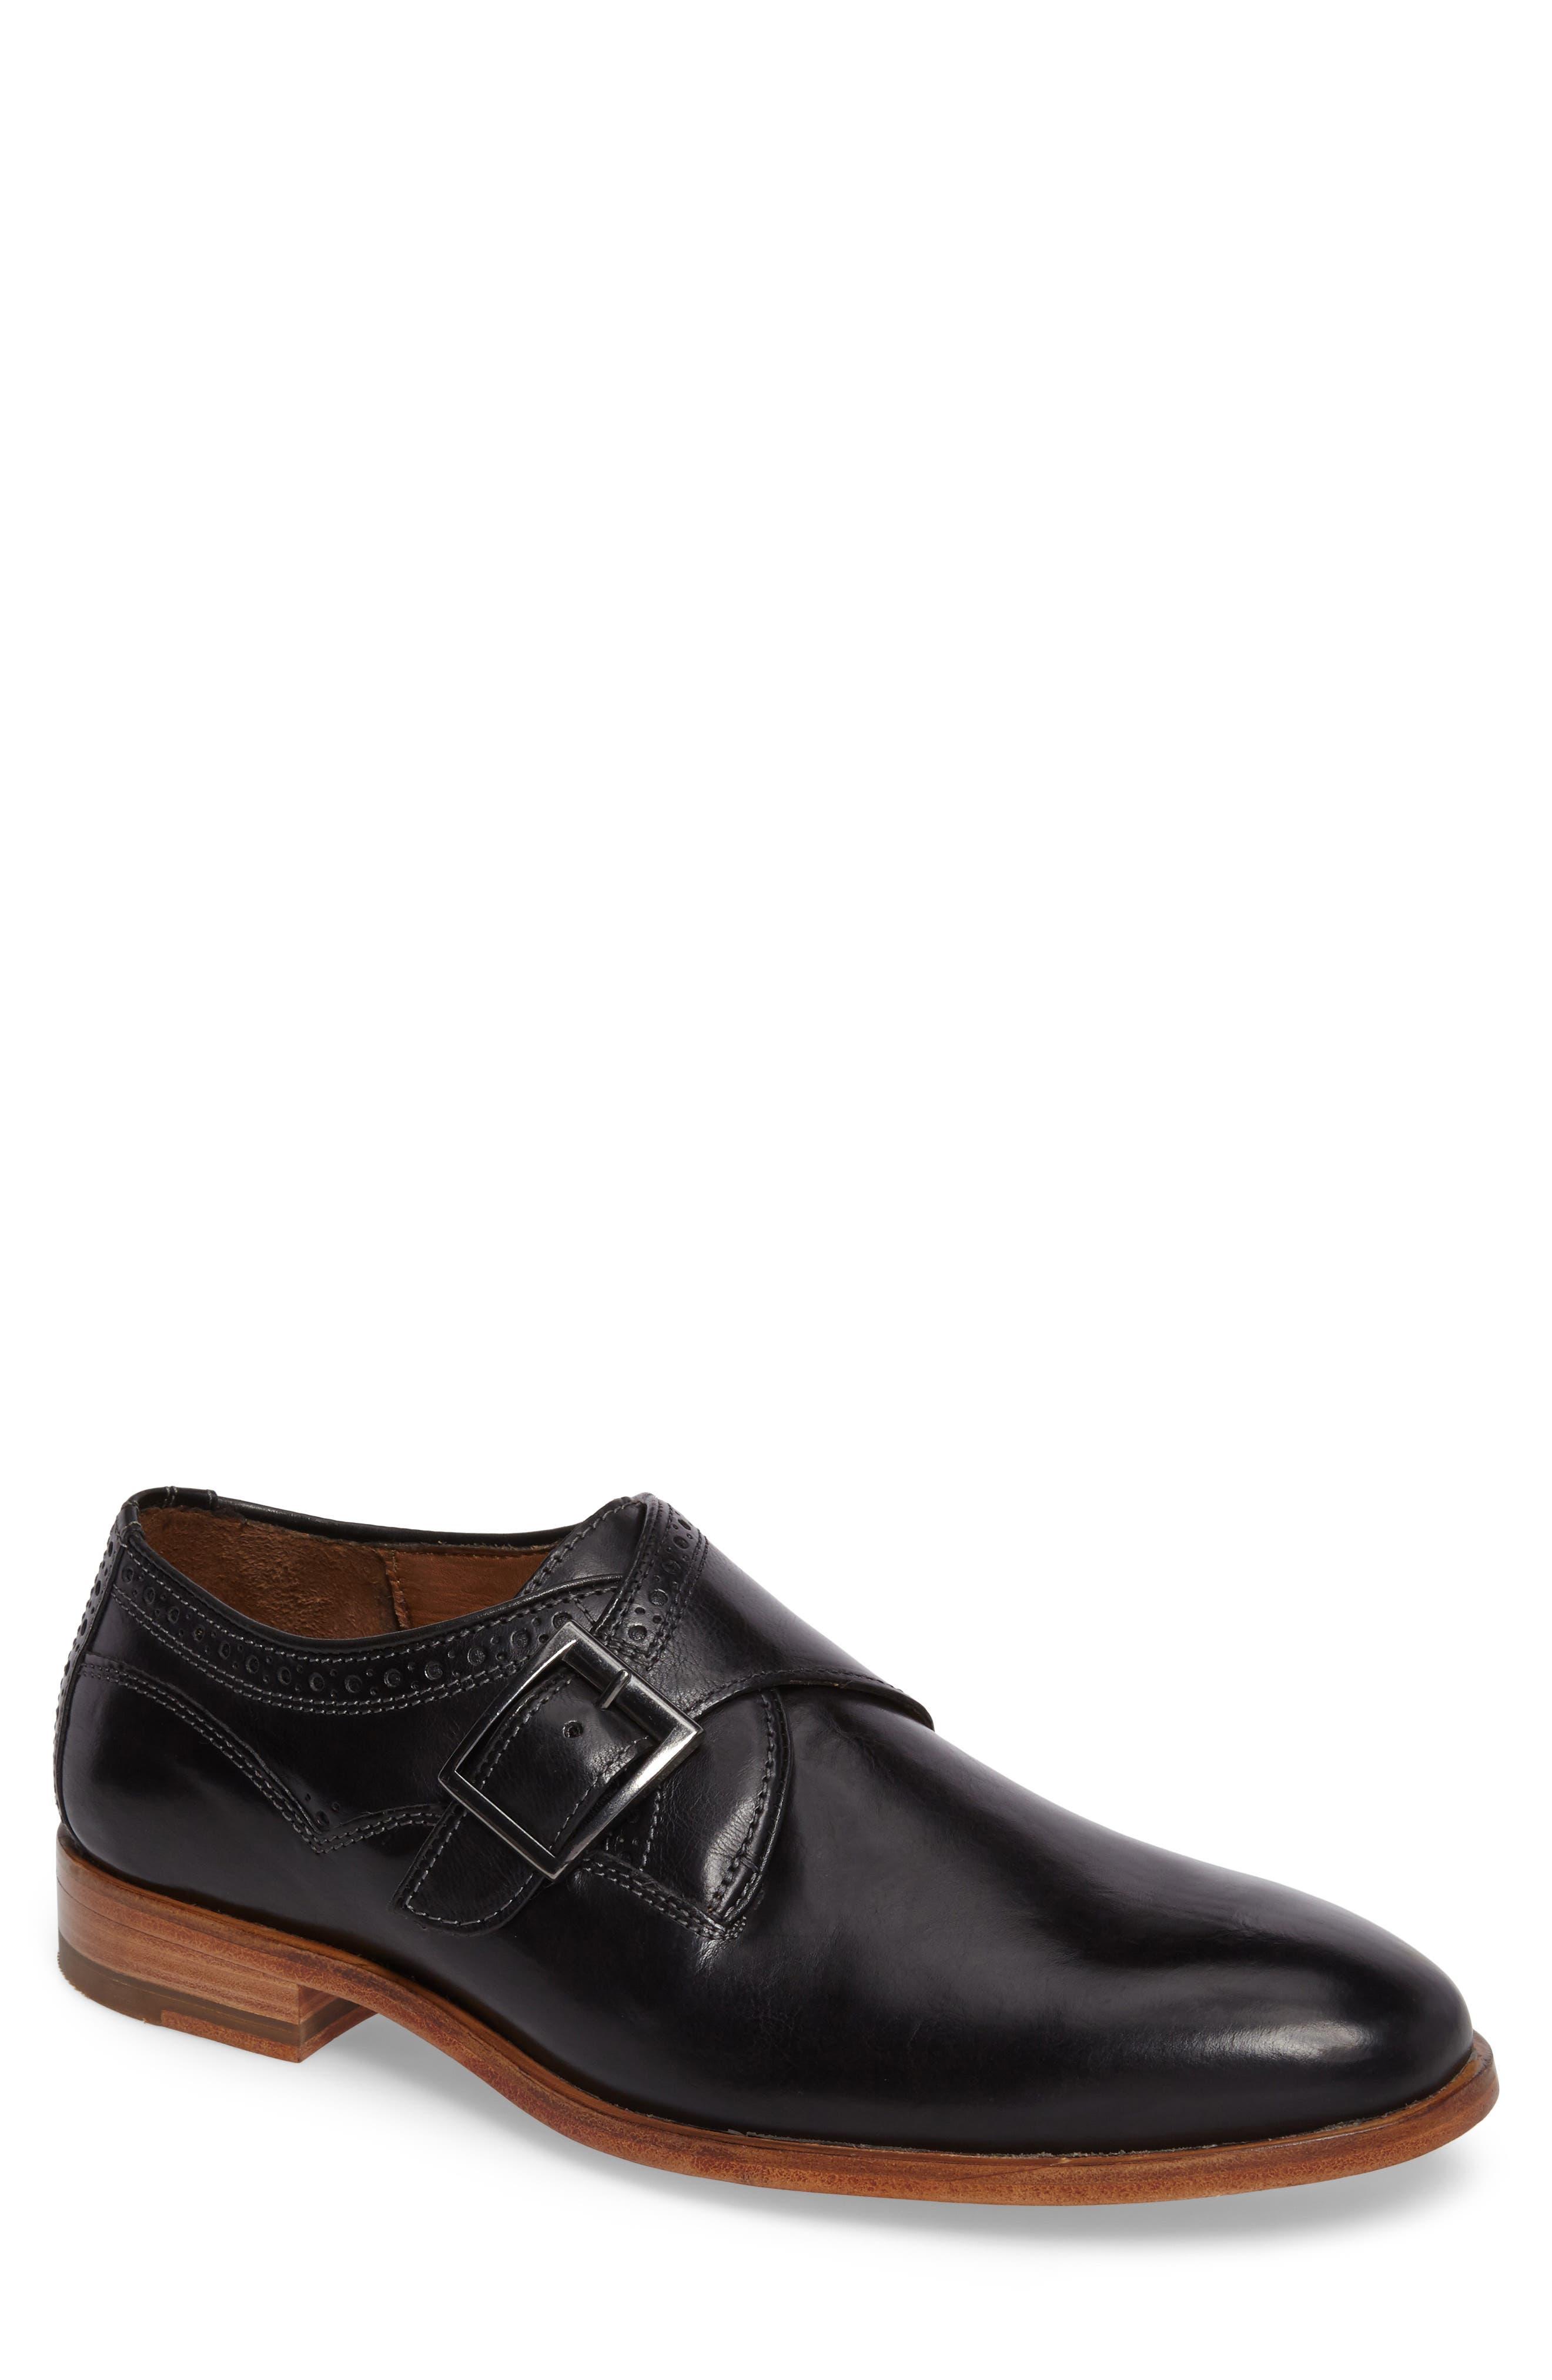 Main Image - J&M 1850 Graham Monk Strap Shoe (Men)